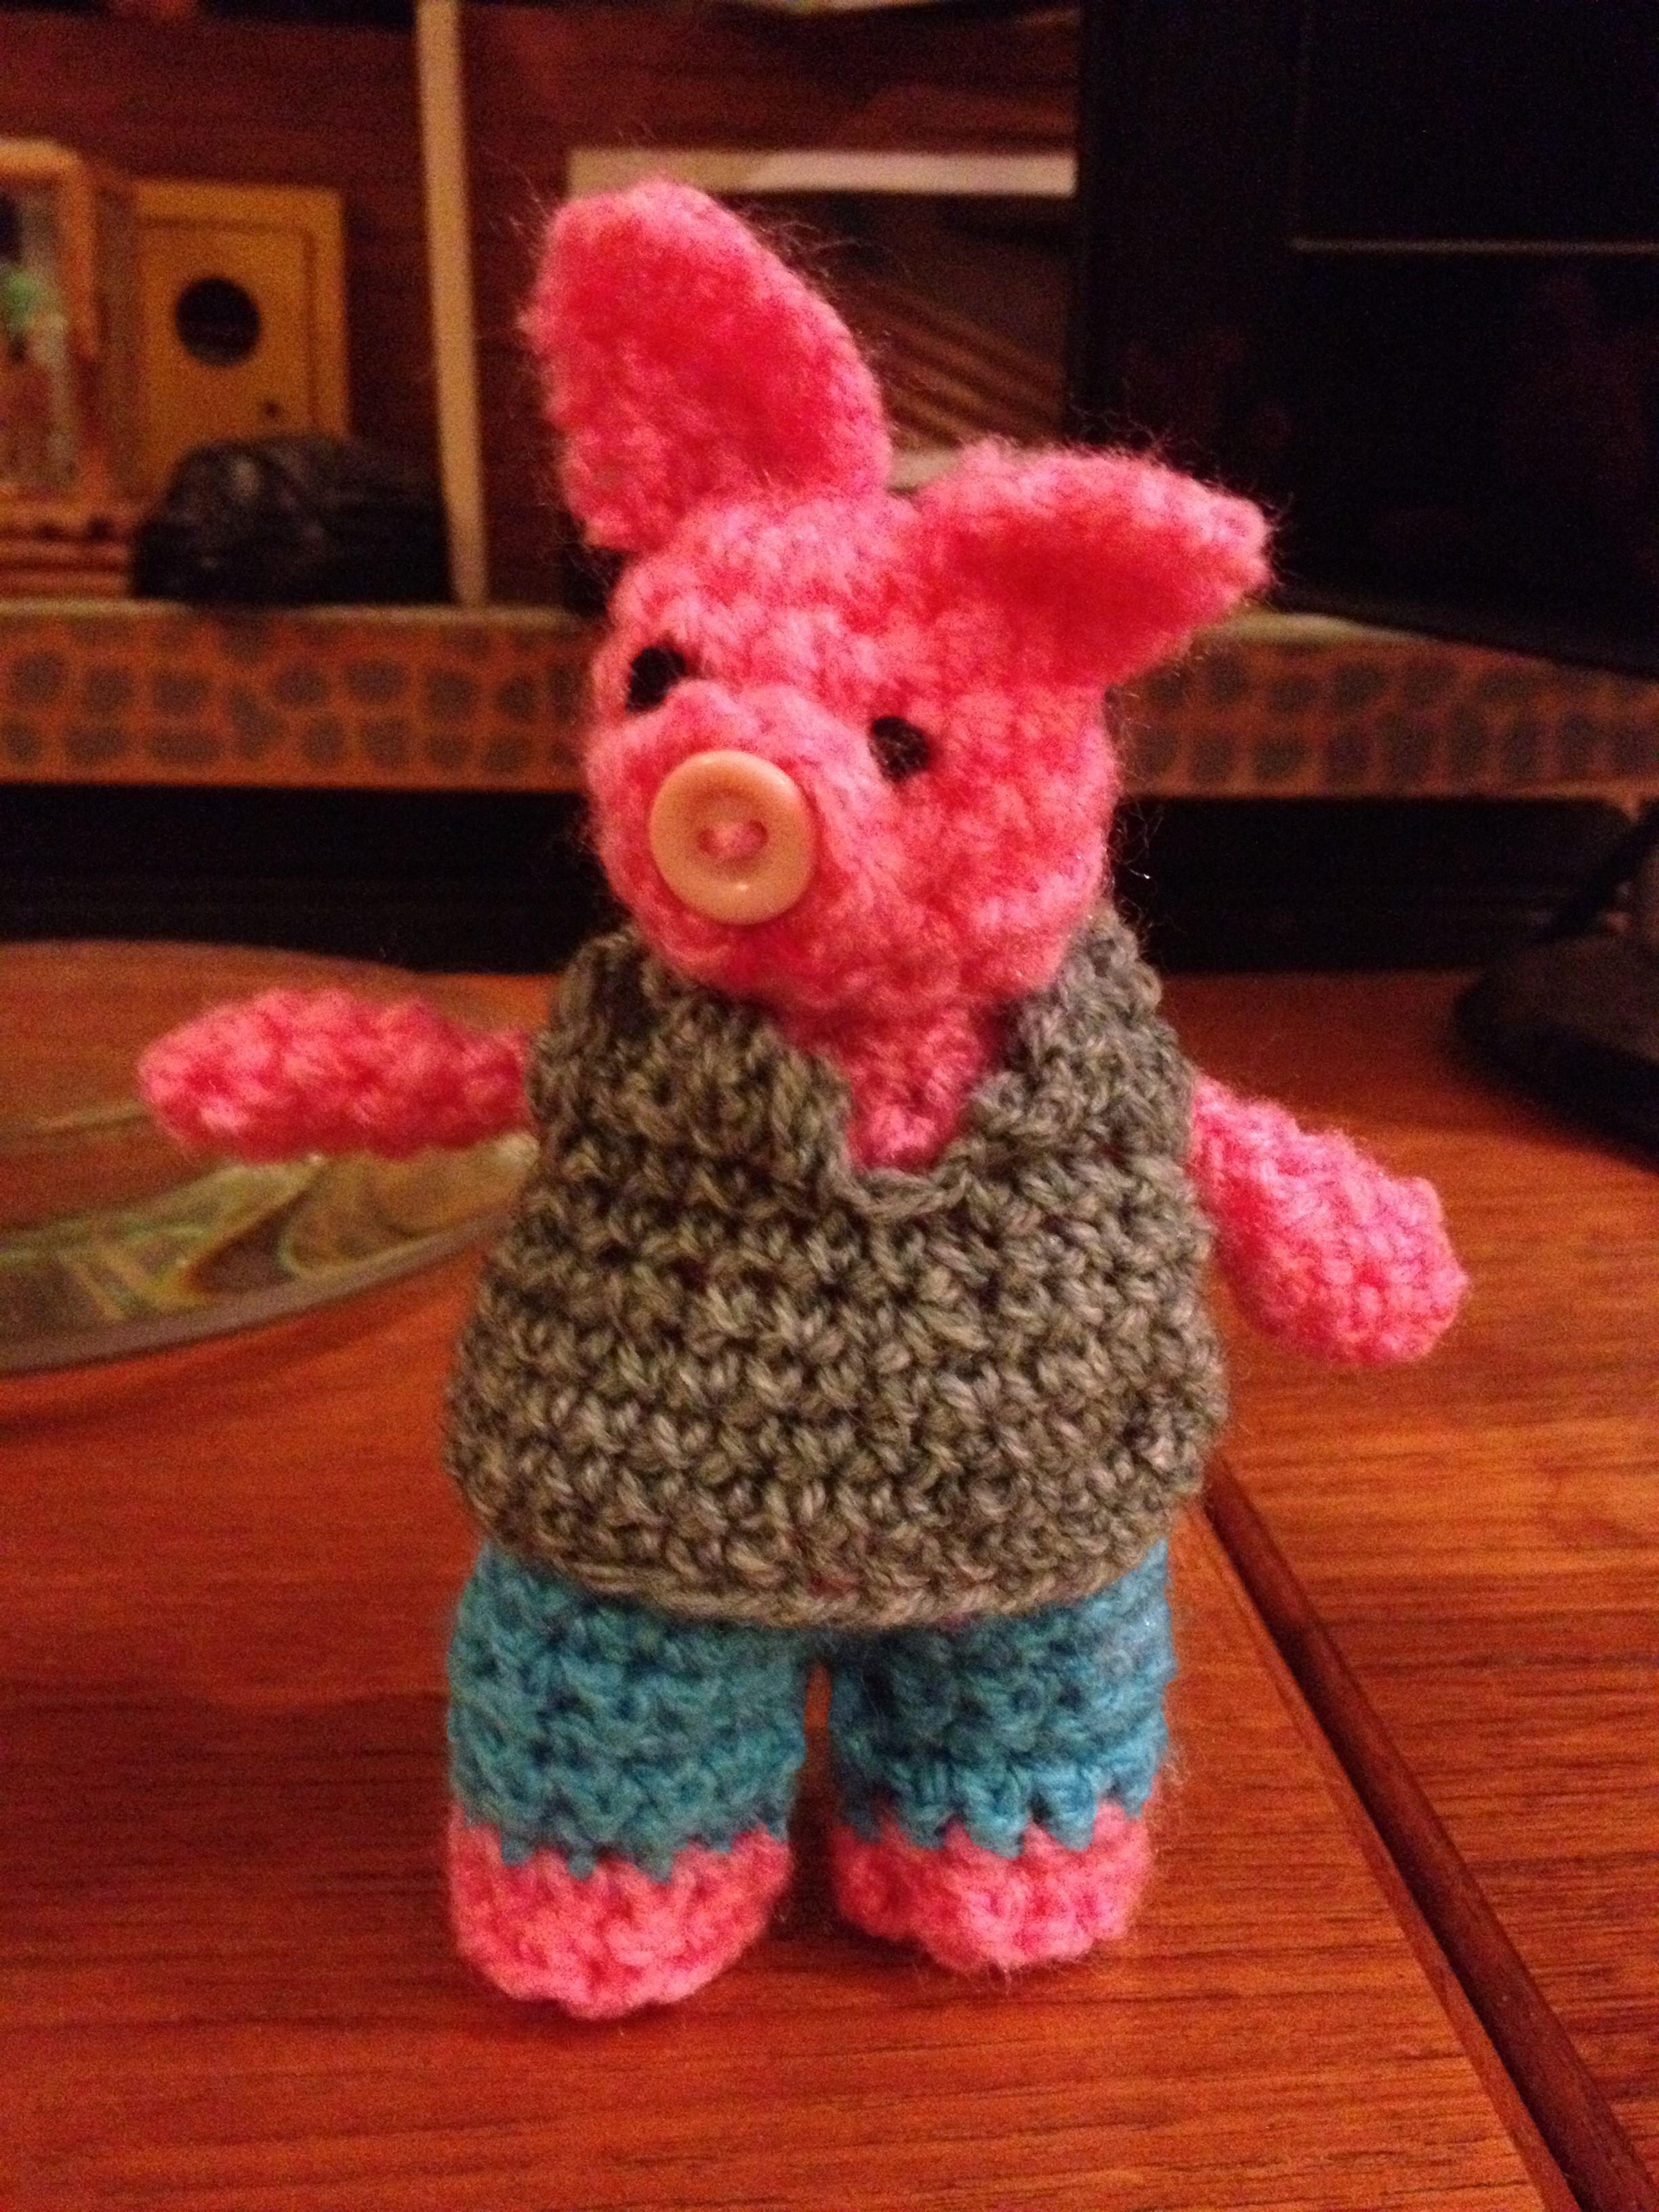 One Little Crocheted Pig